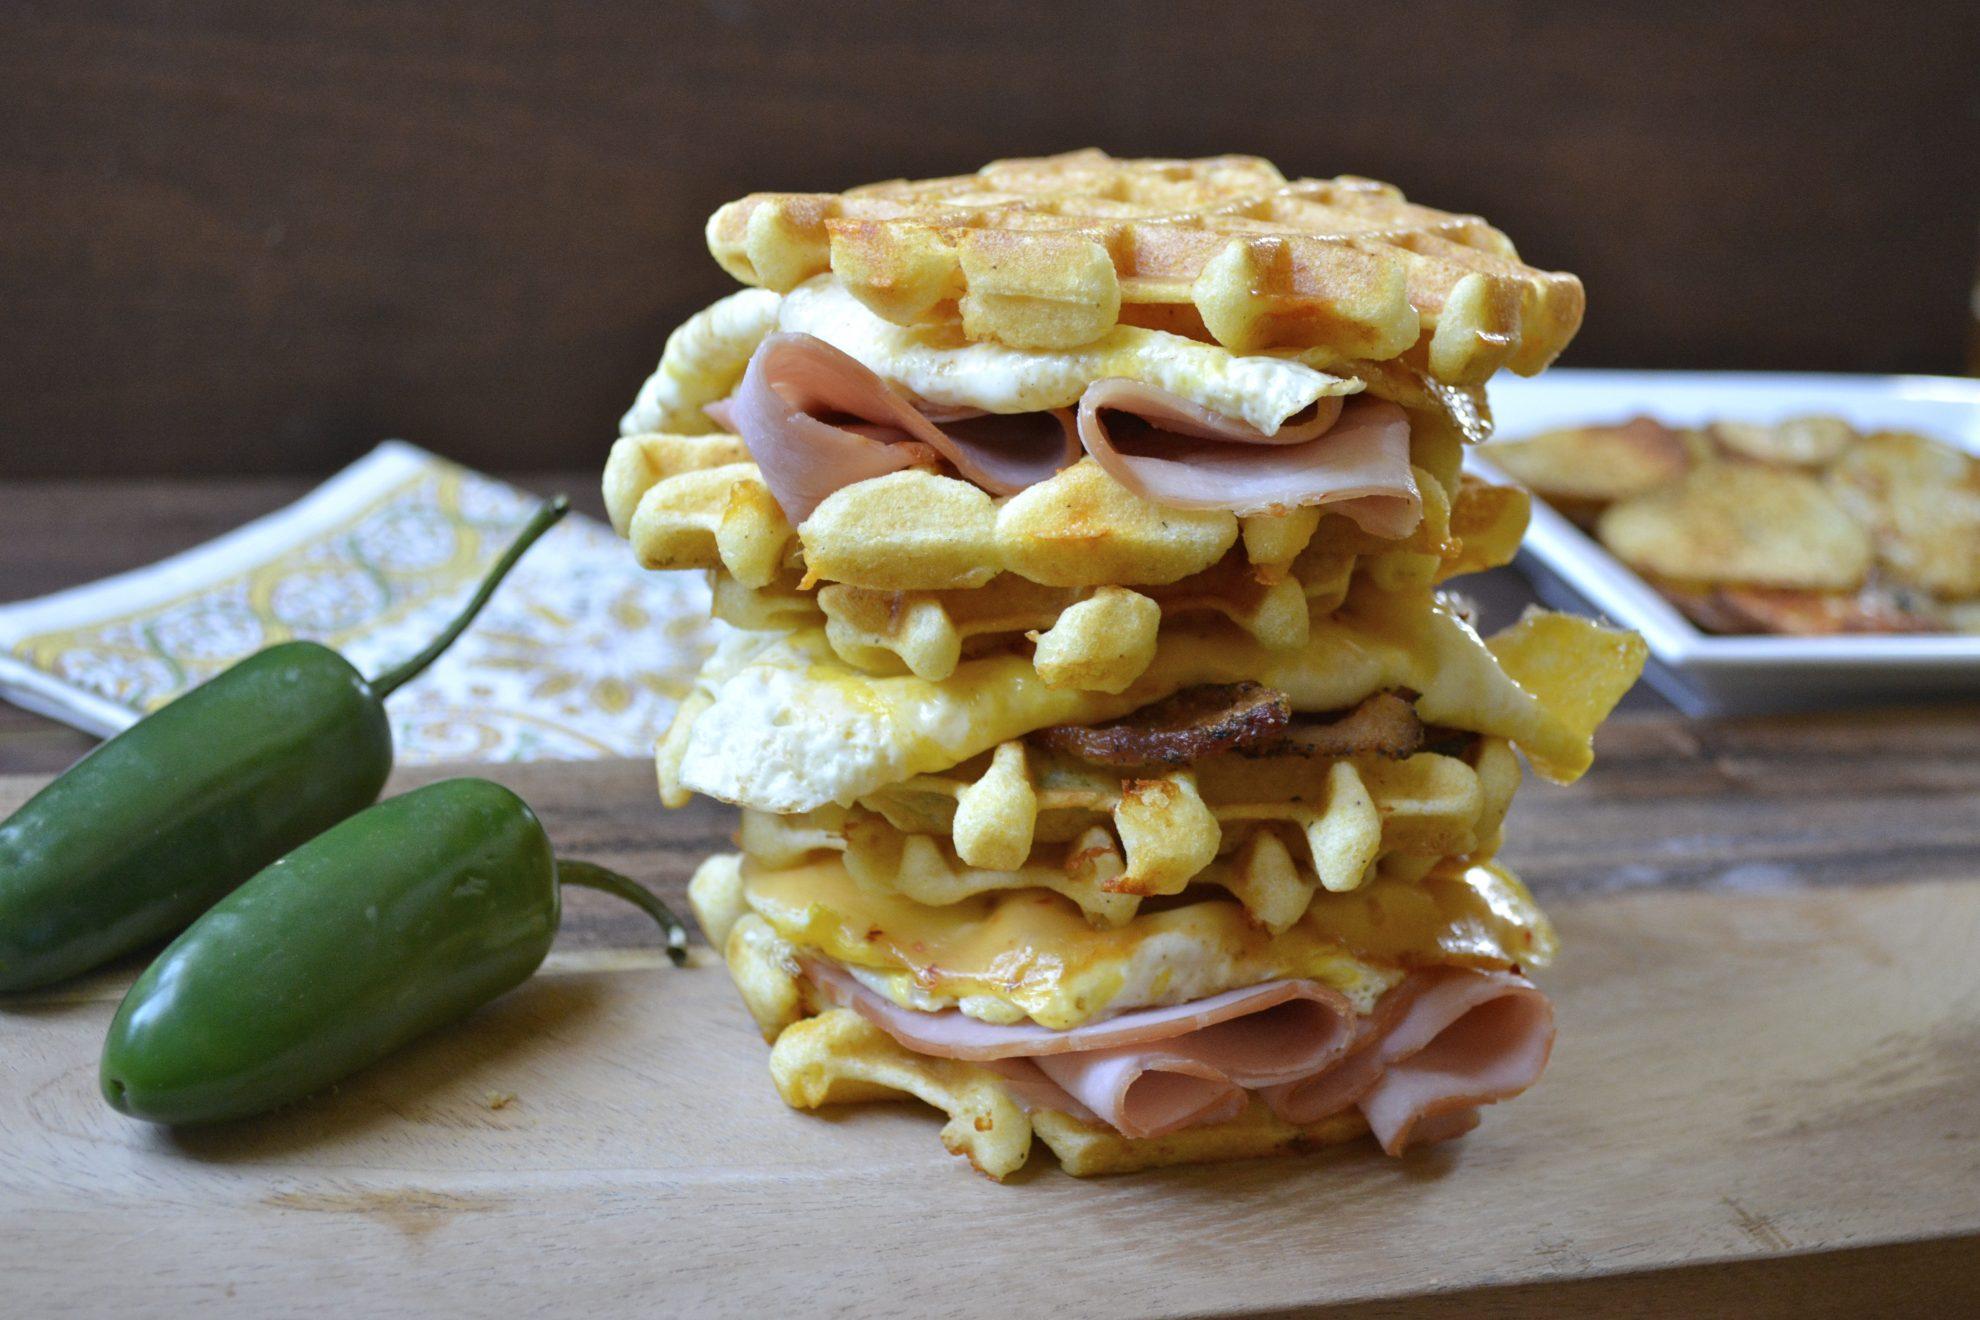 Jalapeño Cheddar Cornmeal Waffles - Maebells